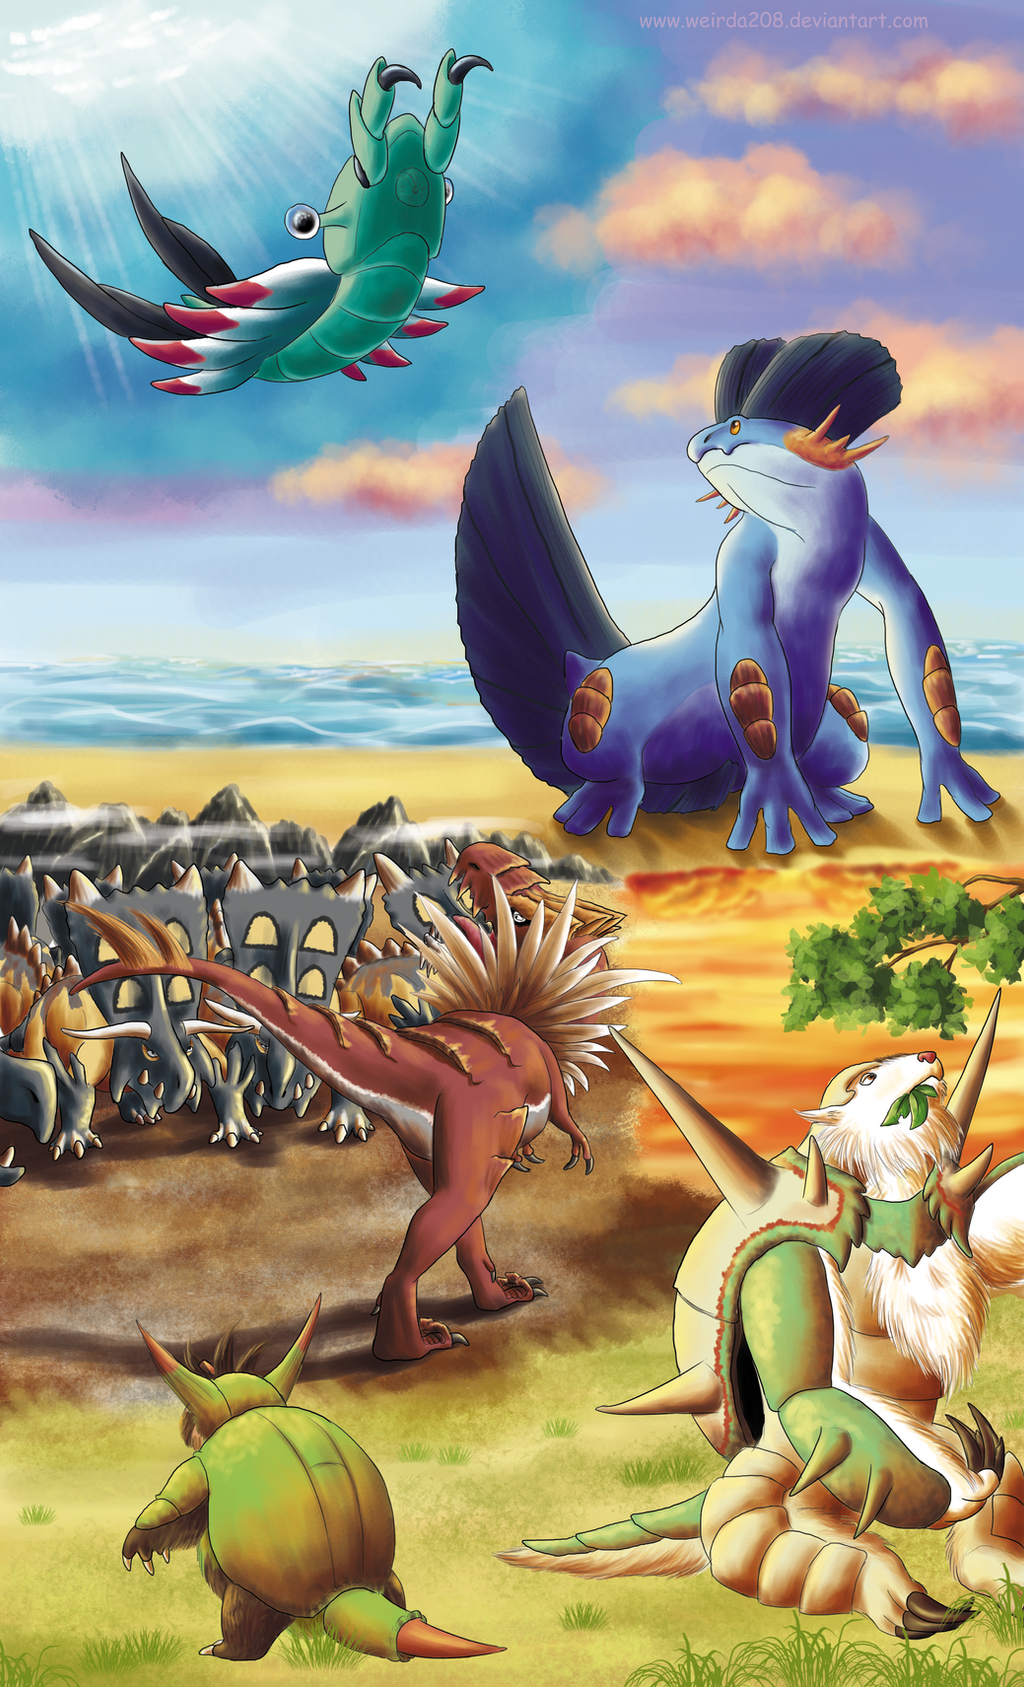 The wonderful Pokemon prehistory by Weirda-s-M-art